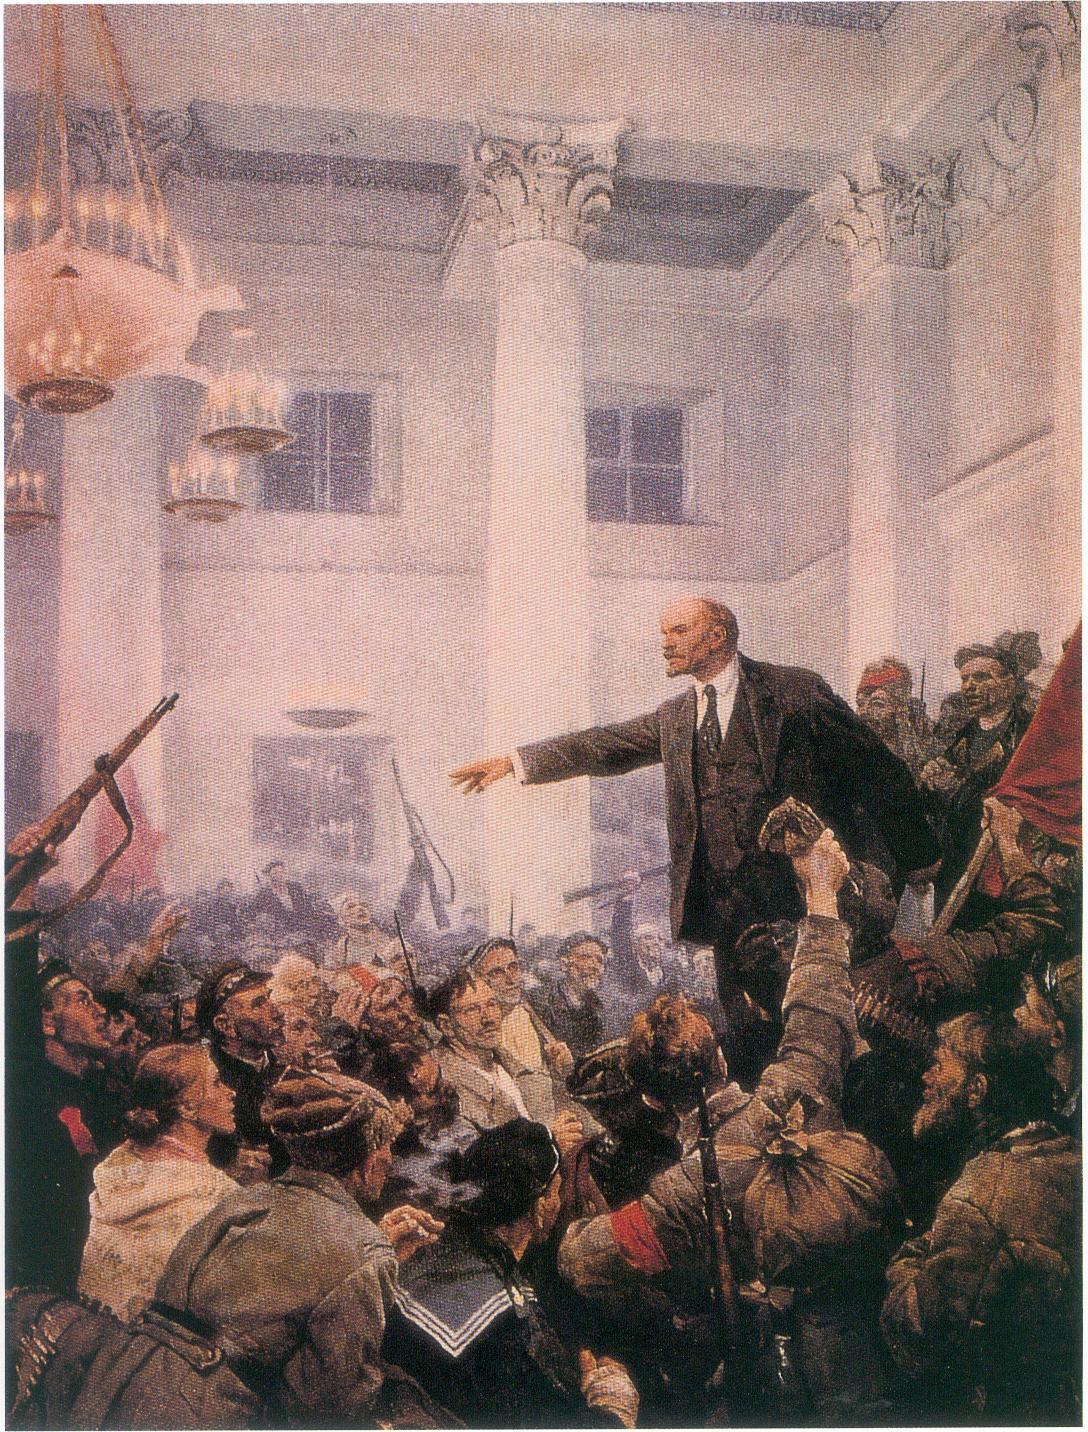 Приём в комсомол картина написана в 1949